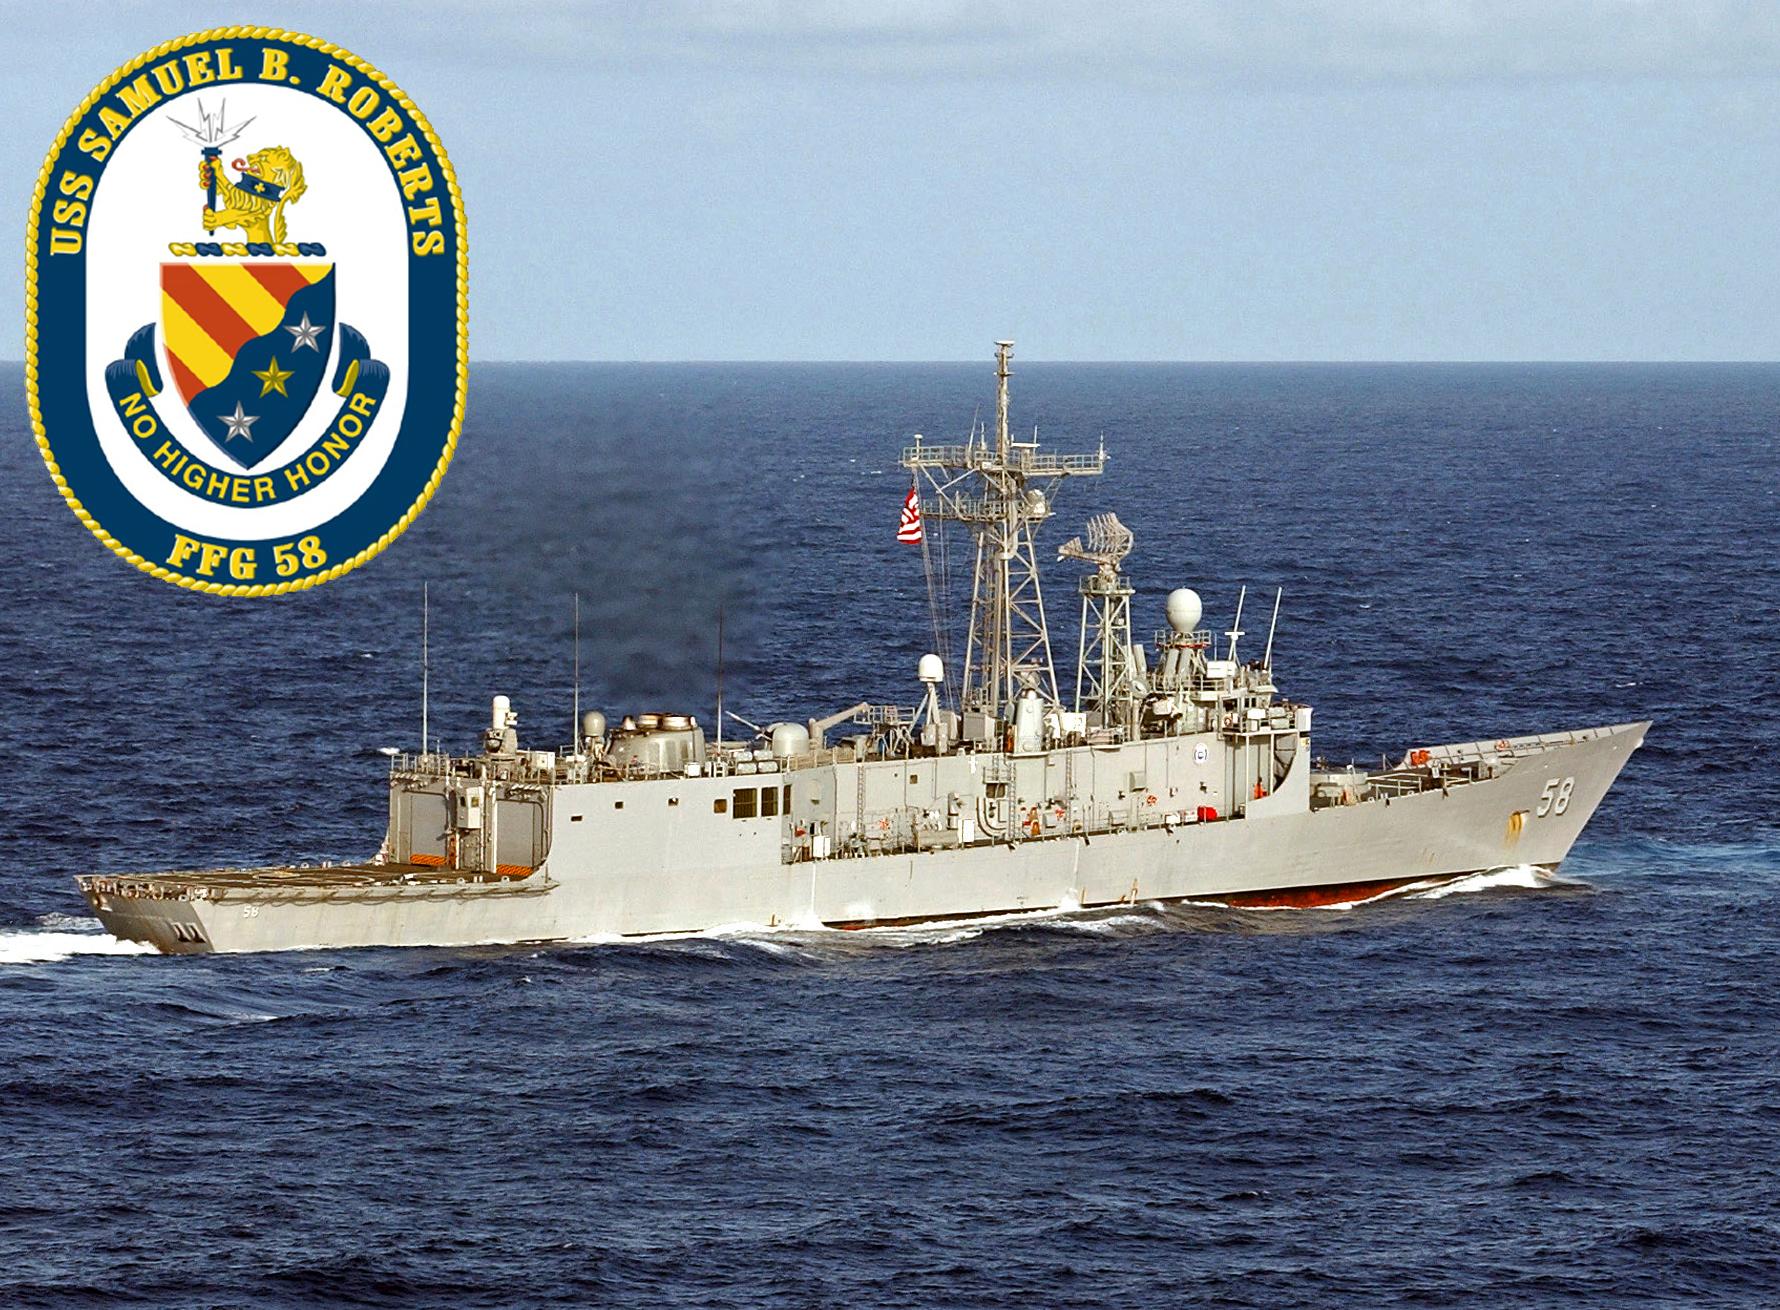 USS SAMUEL B. ROBERTS FFG-58 Bild und Grafik: U.S. Navy